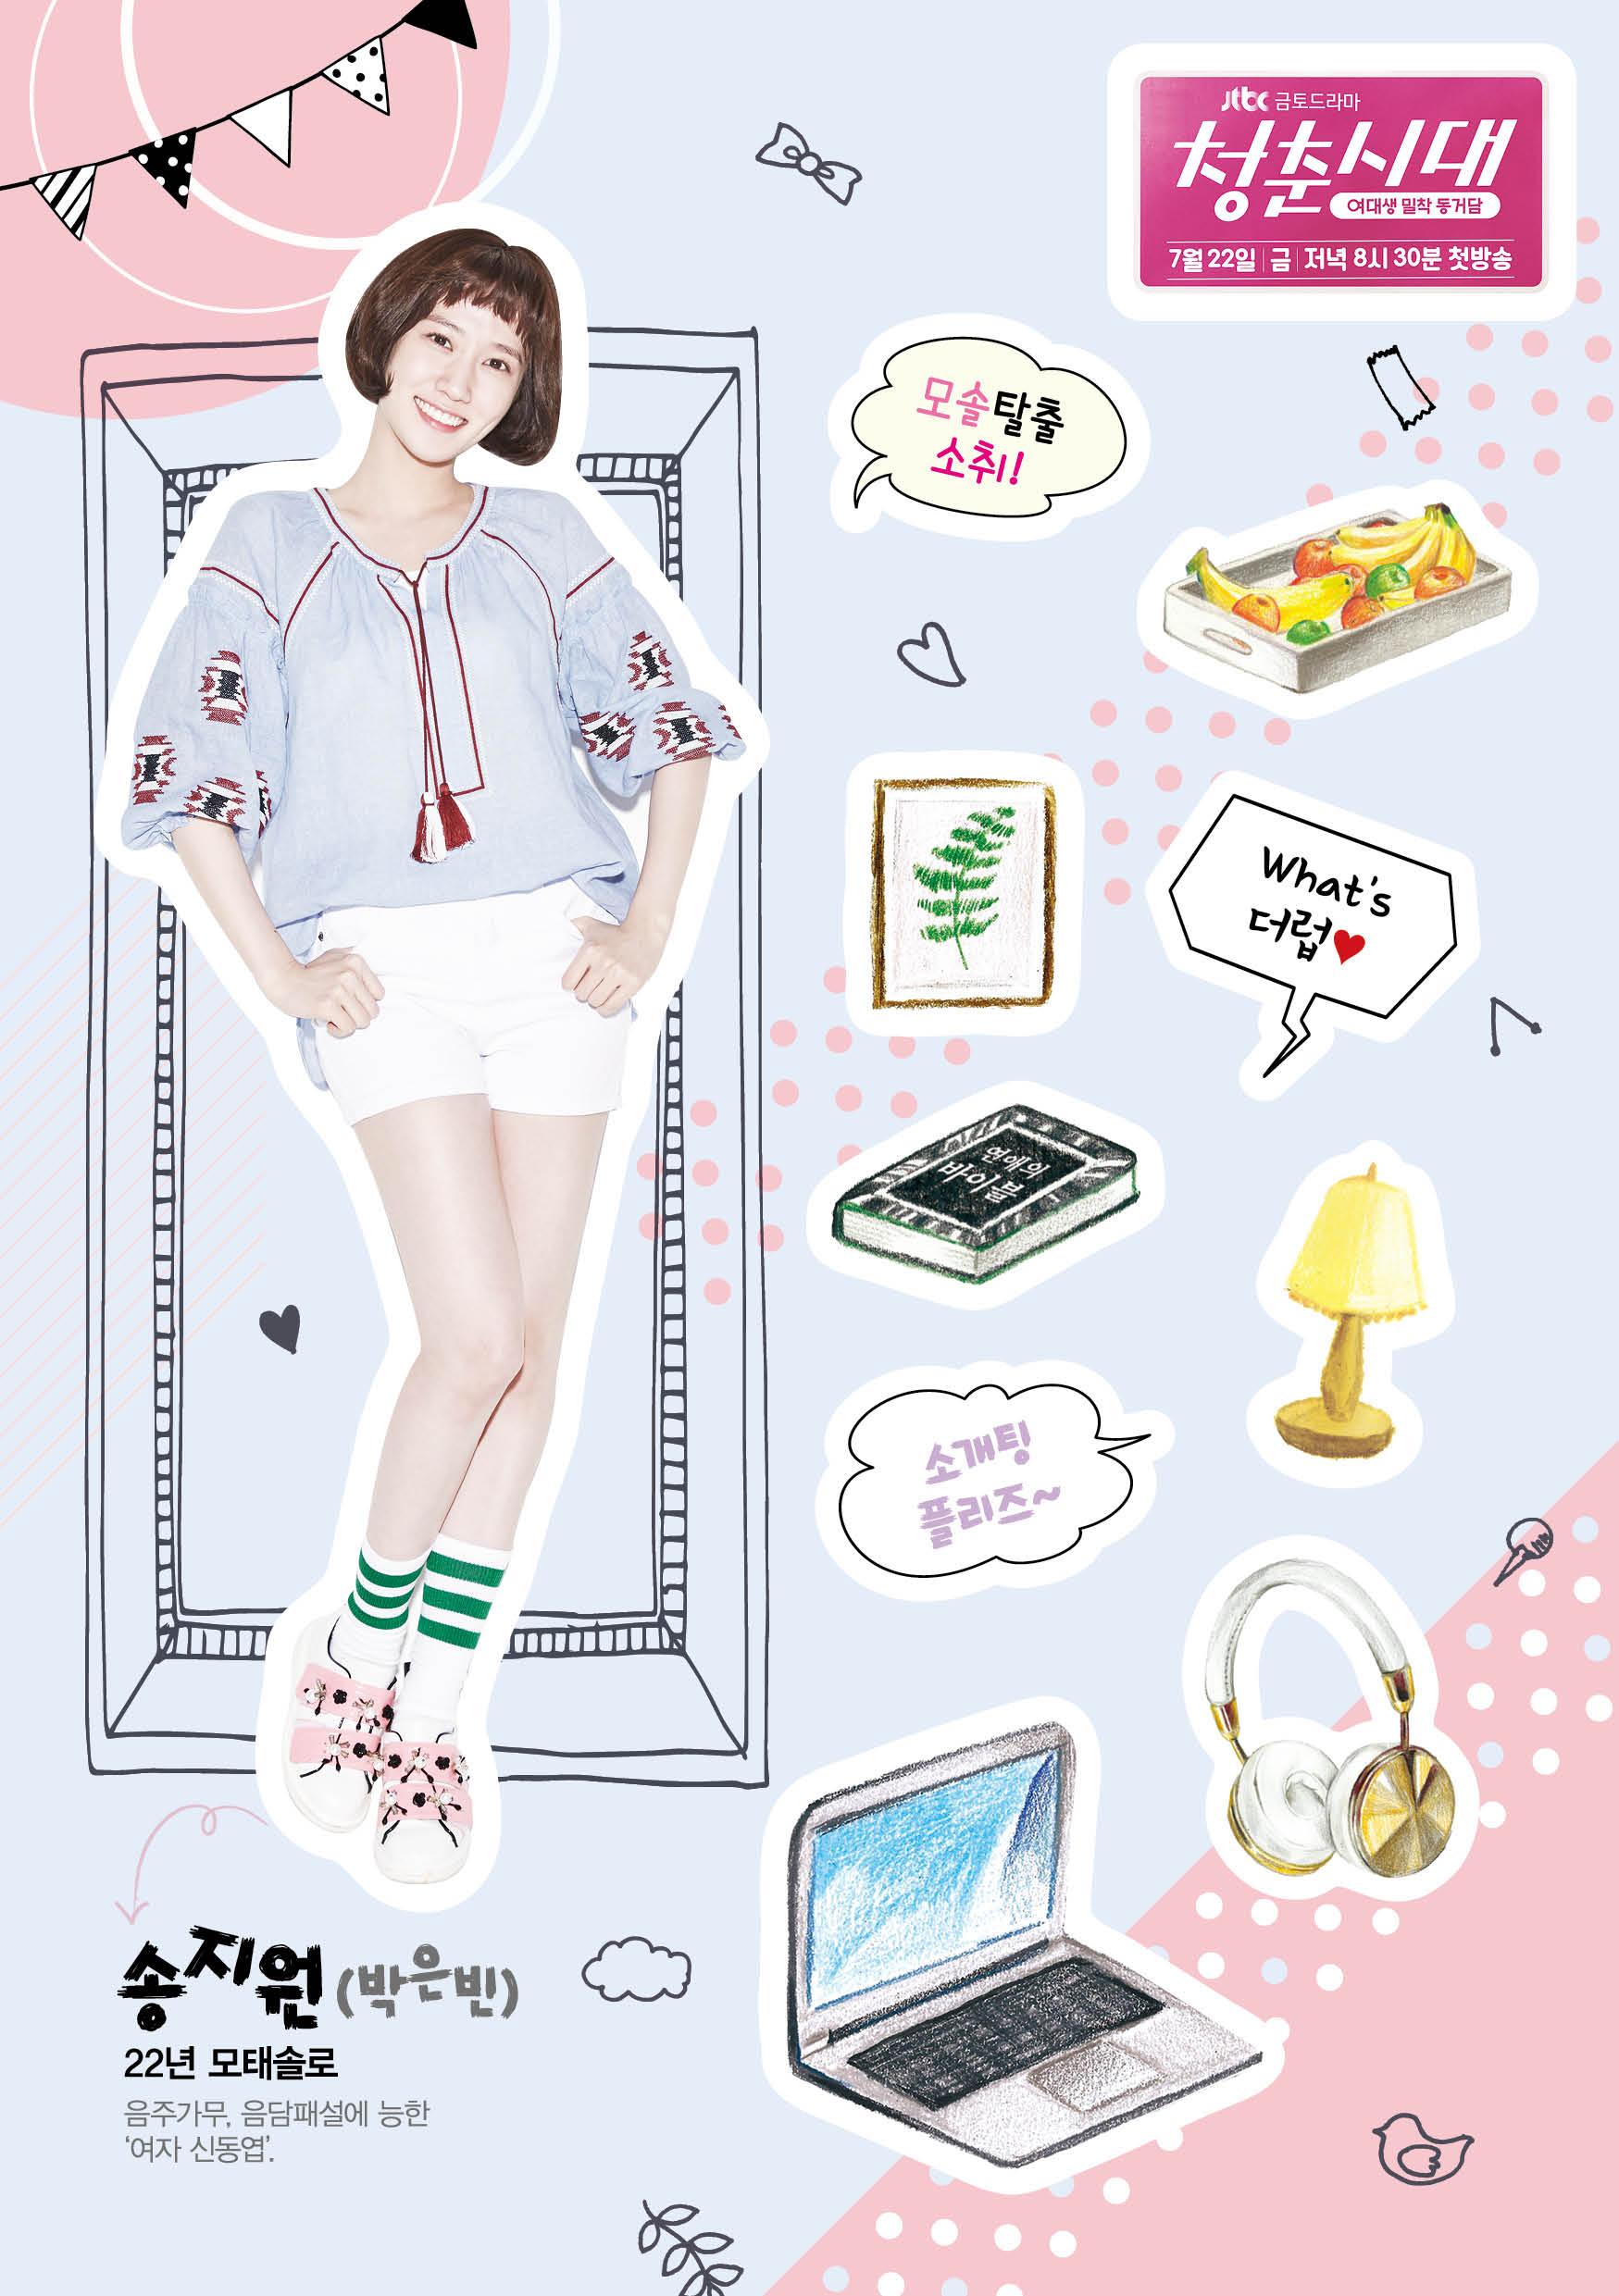 Park Eun Bin Android Iphone Wallpaper 65787 Asiachan